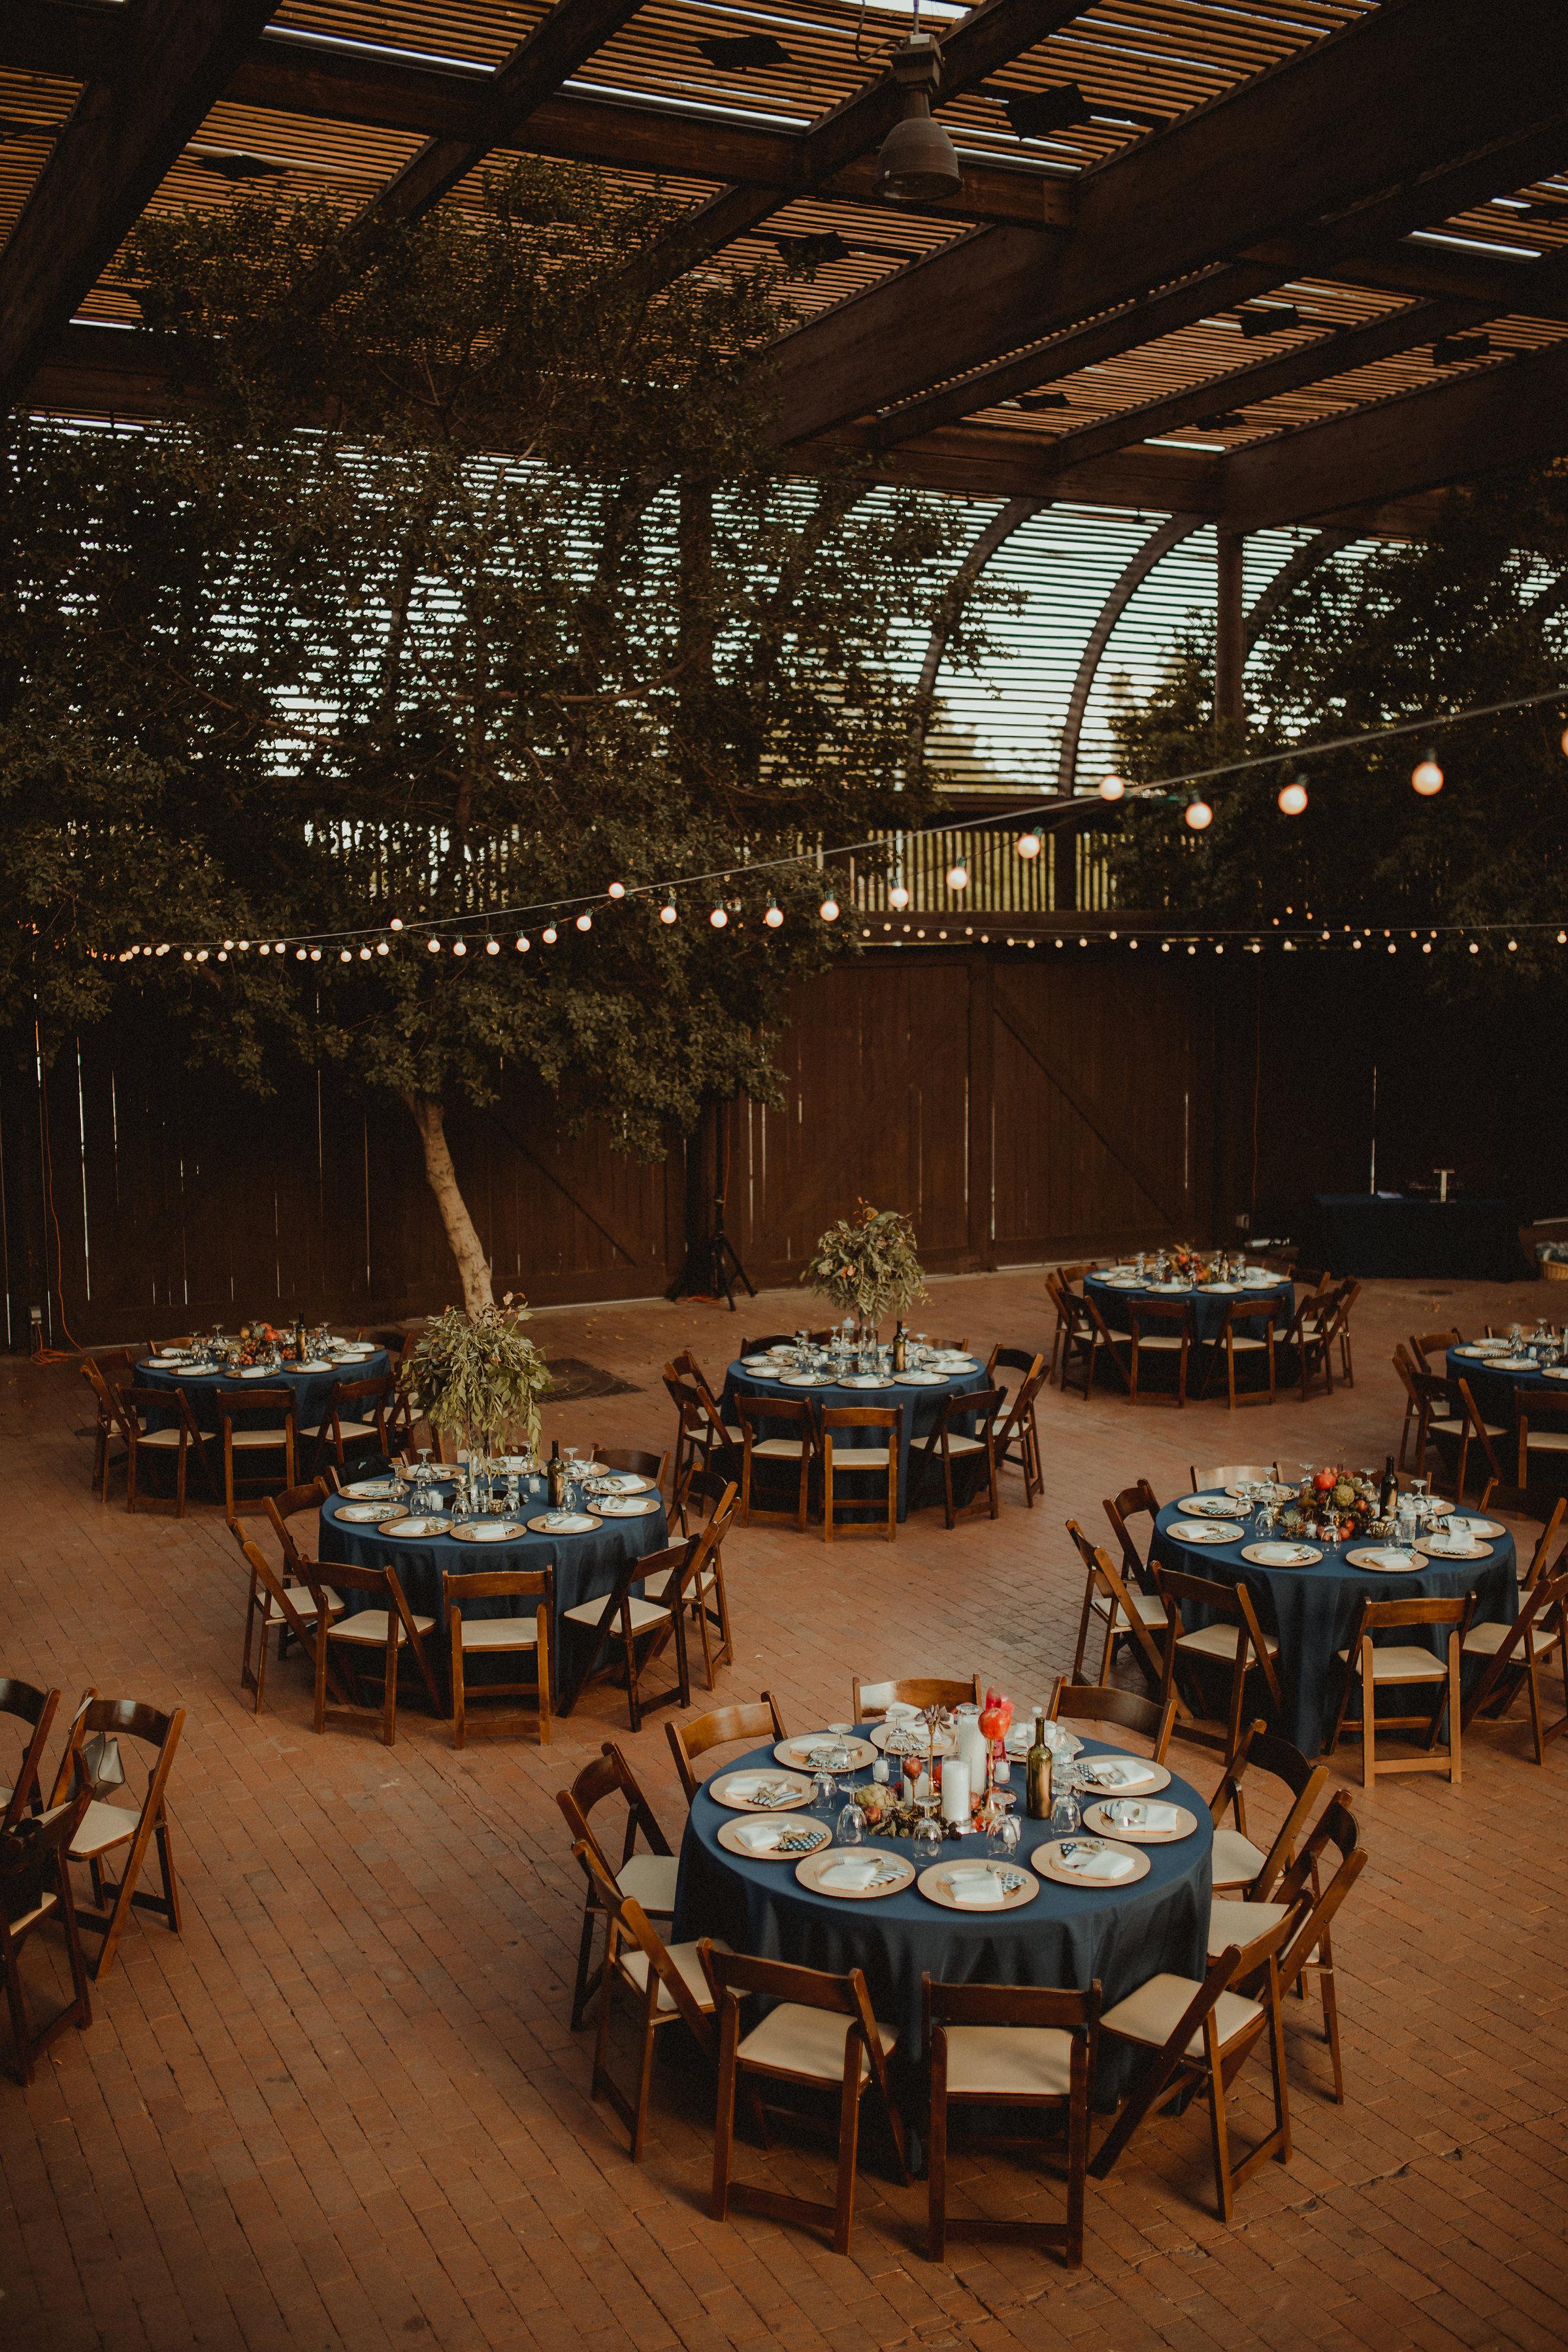 Phoenix Foodies Dream Food-Truck-Filled Wedding: Lauren & Blaise - Konsider It Done- AZ Arizona Wedding & Event Planner, Designer, Coordinator Planning in Scottsdale, Phoenix, Paradise Valley, Tempe, Gilbert, Mesa, Chandler, Tucson, Sedona